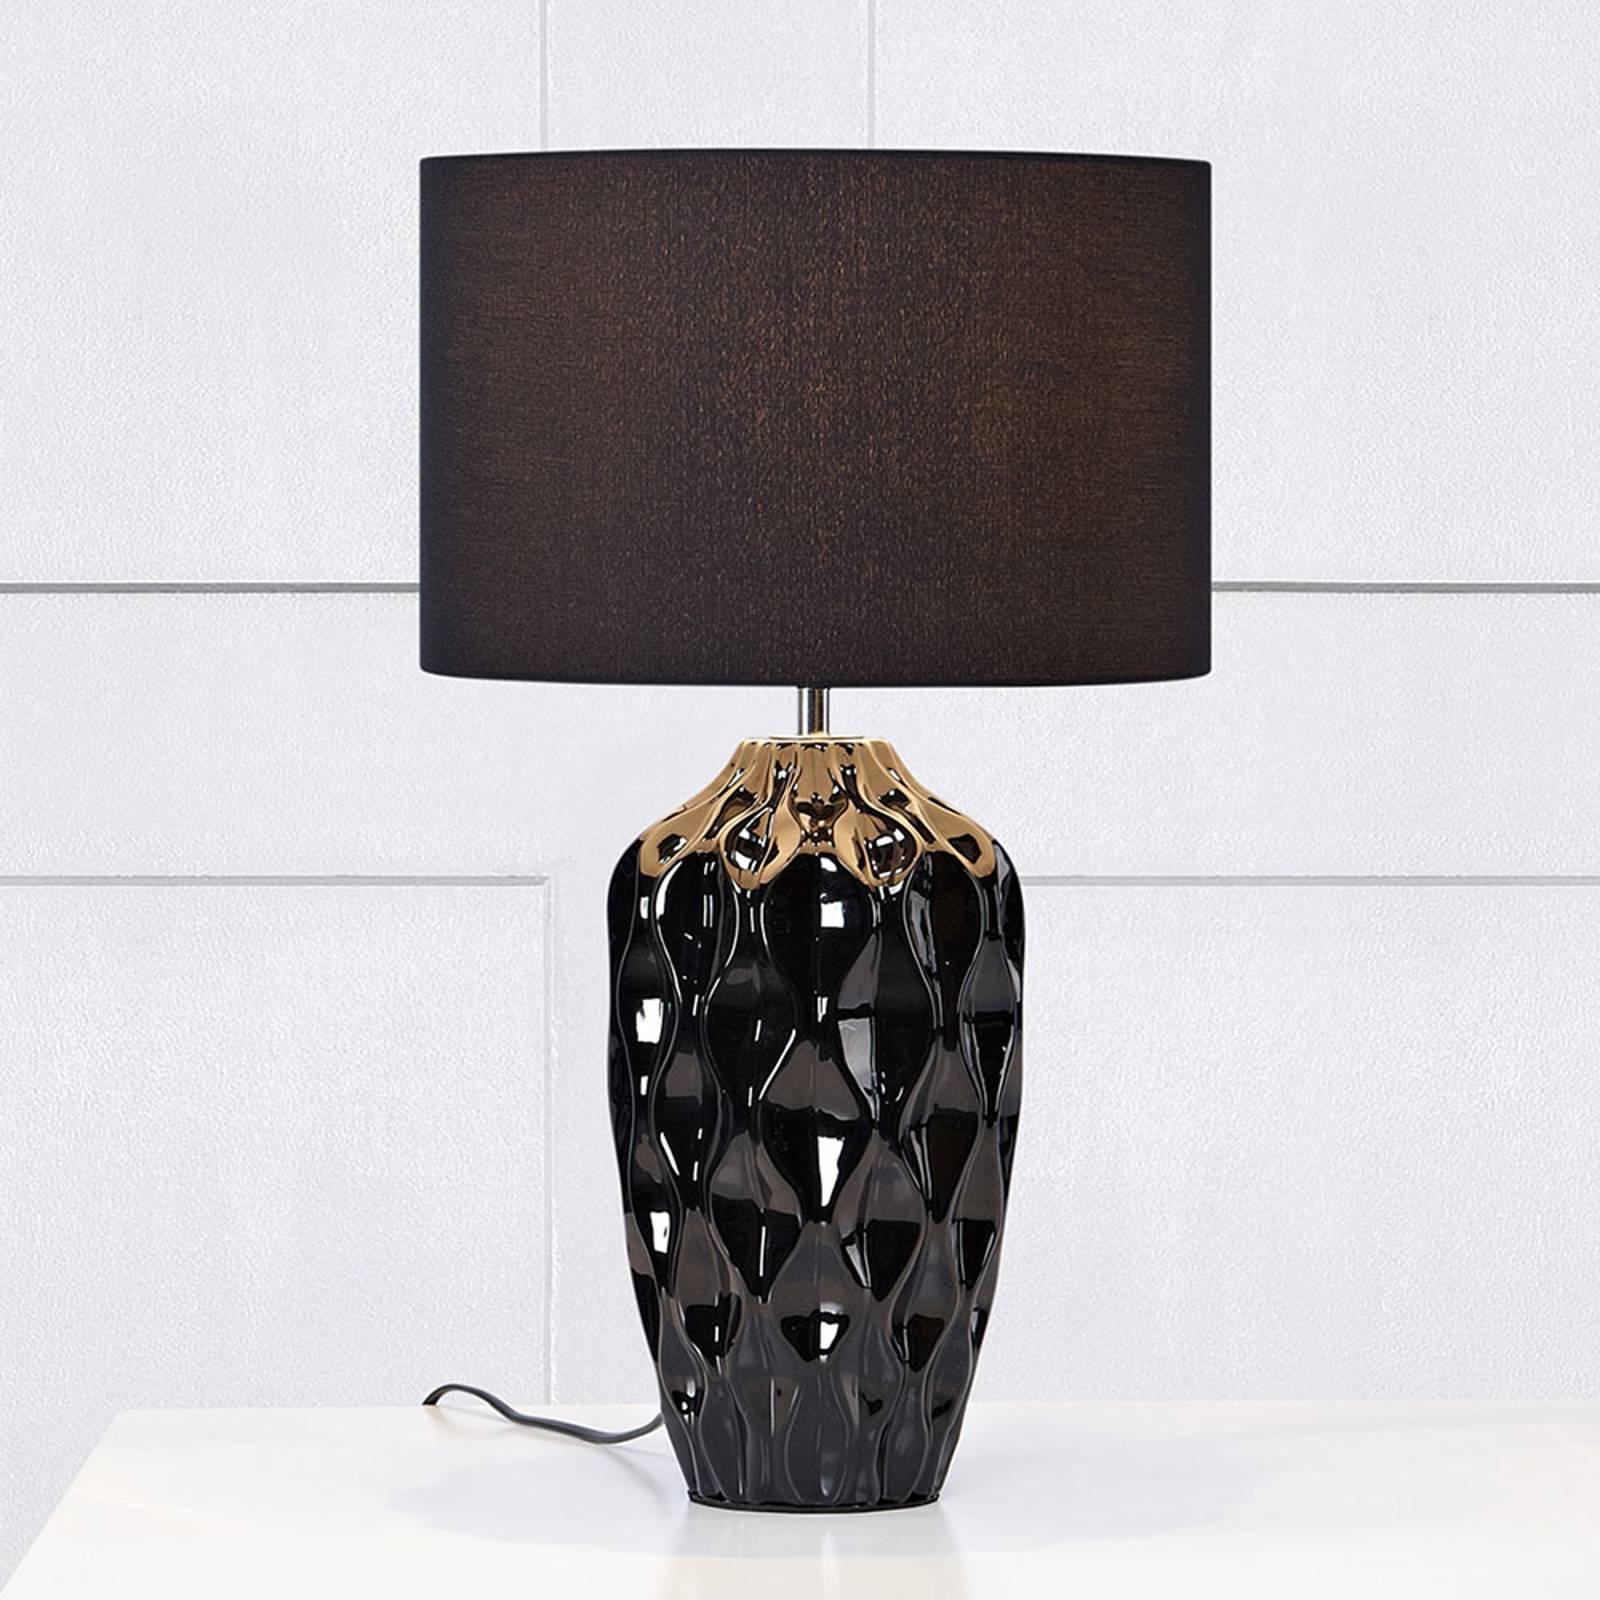 Tafellamp Angela, zwart